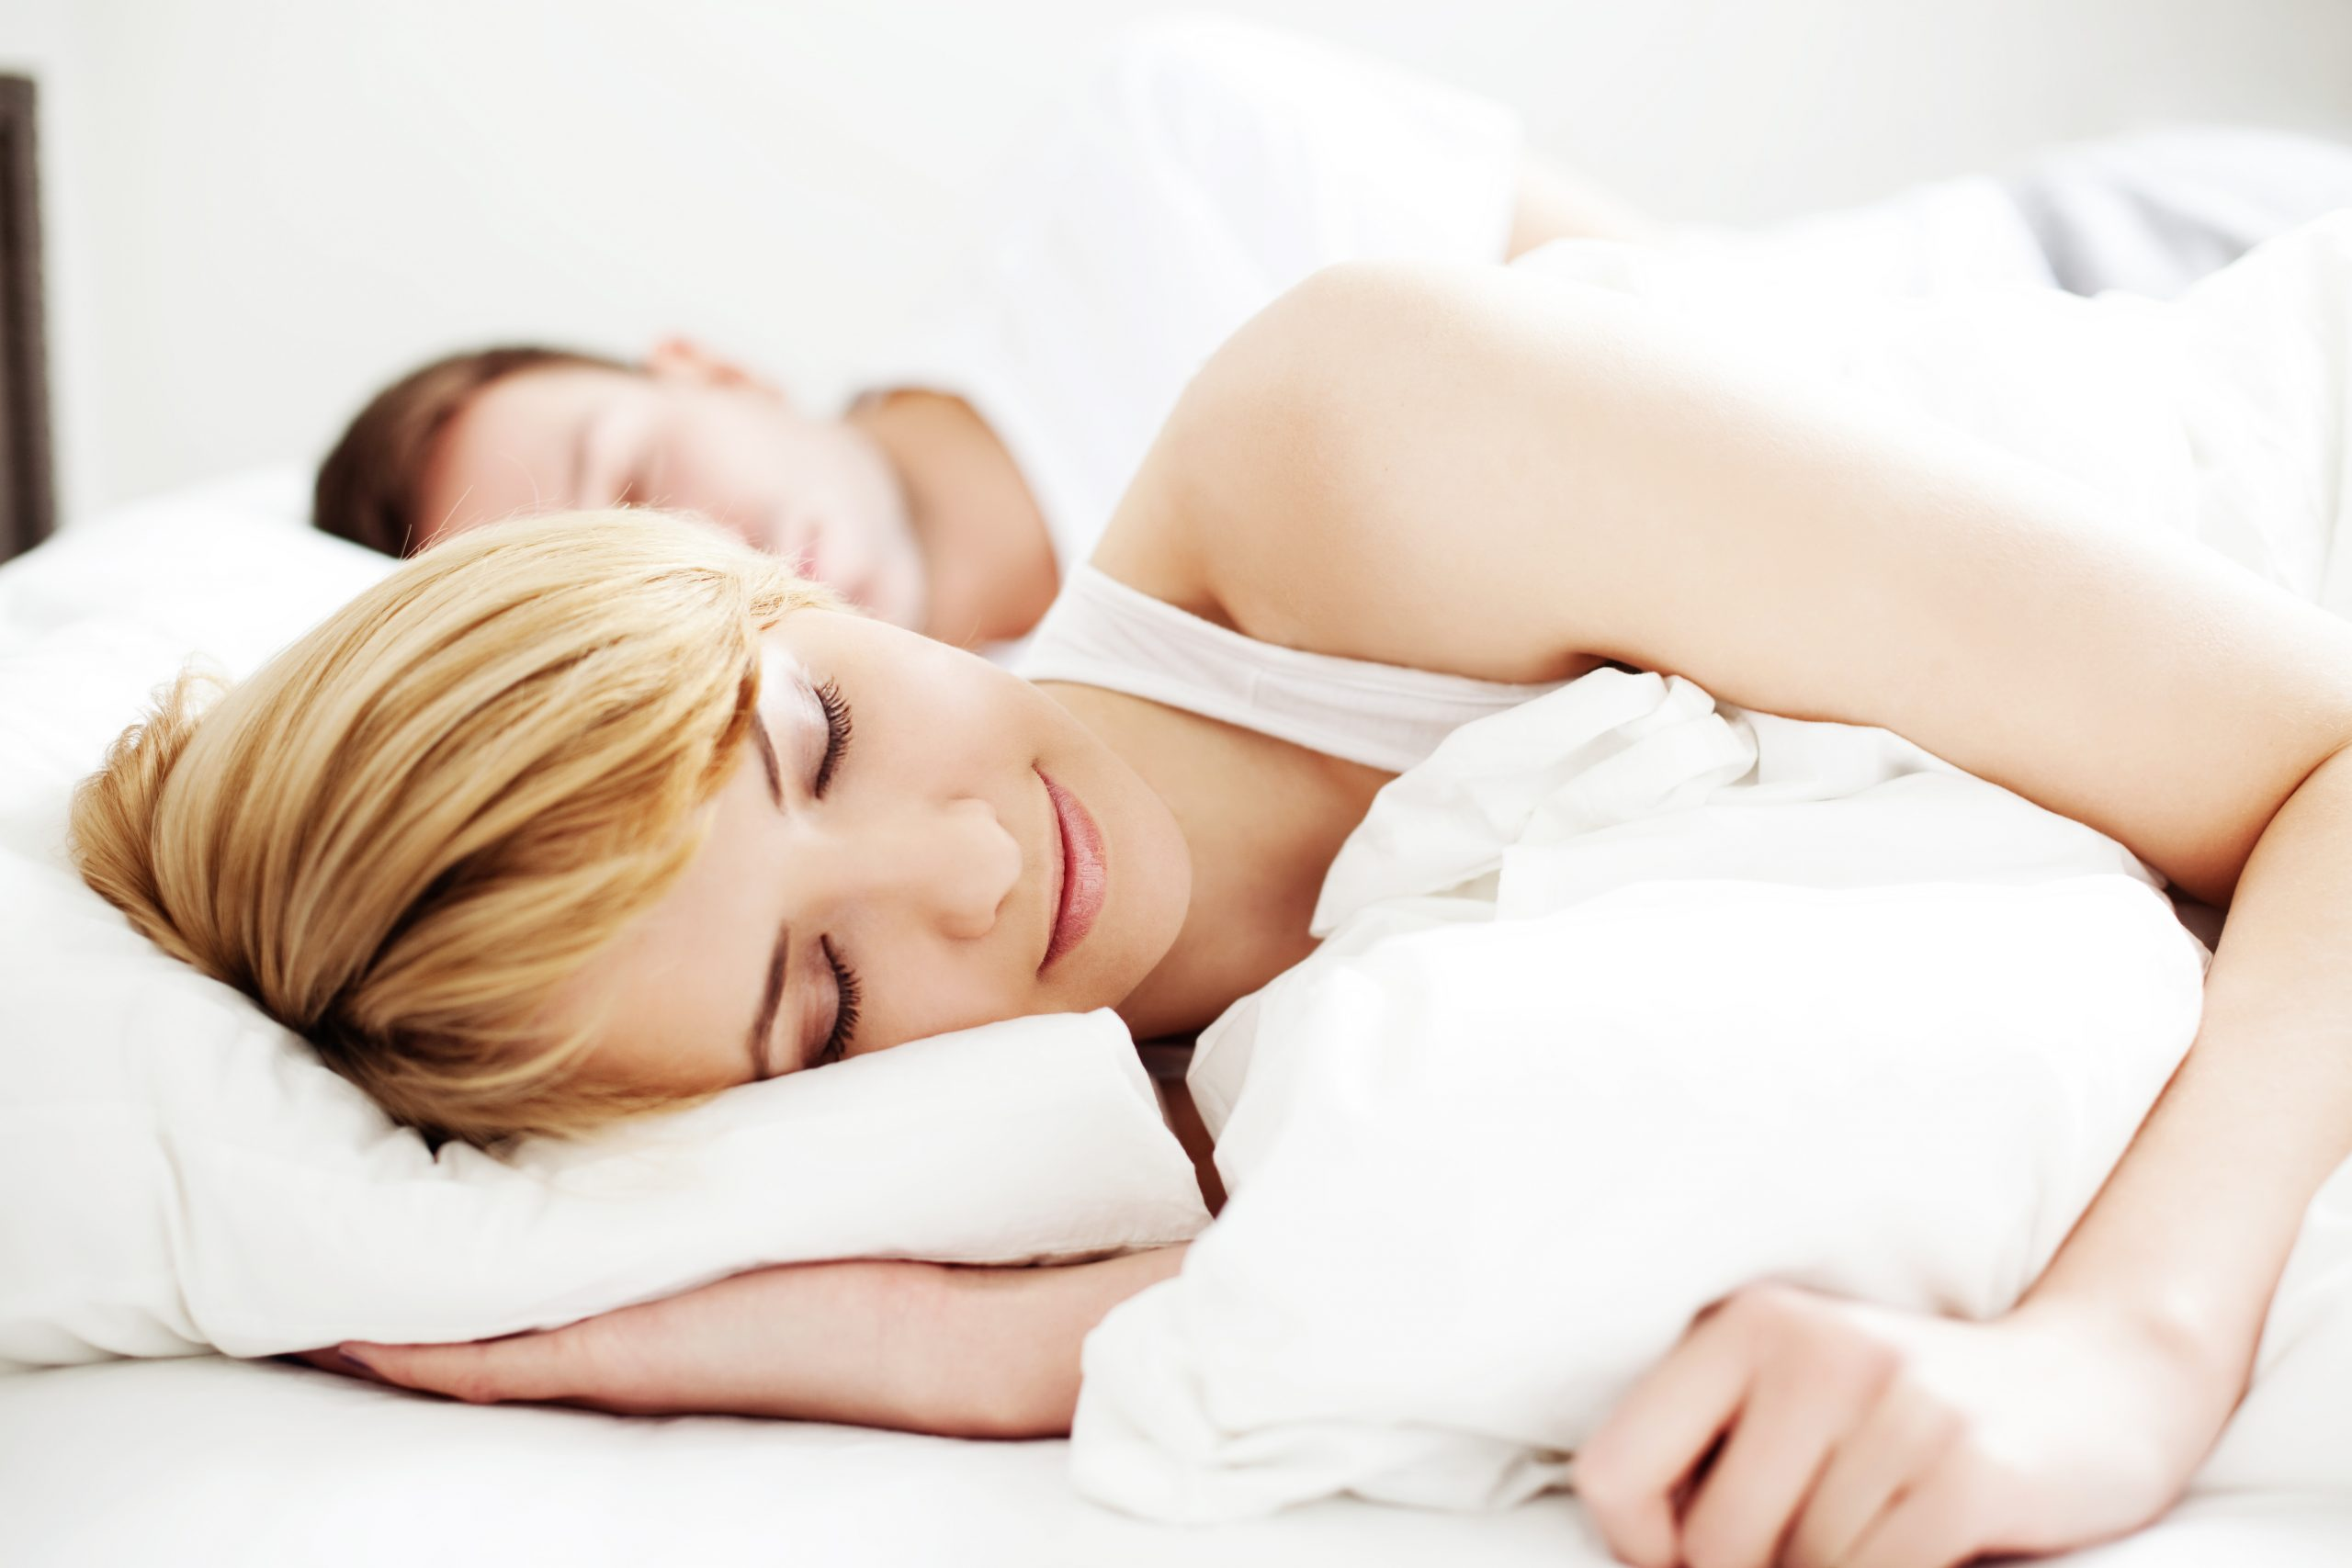 Habits of Health Highlight: Get Some Sleep